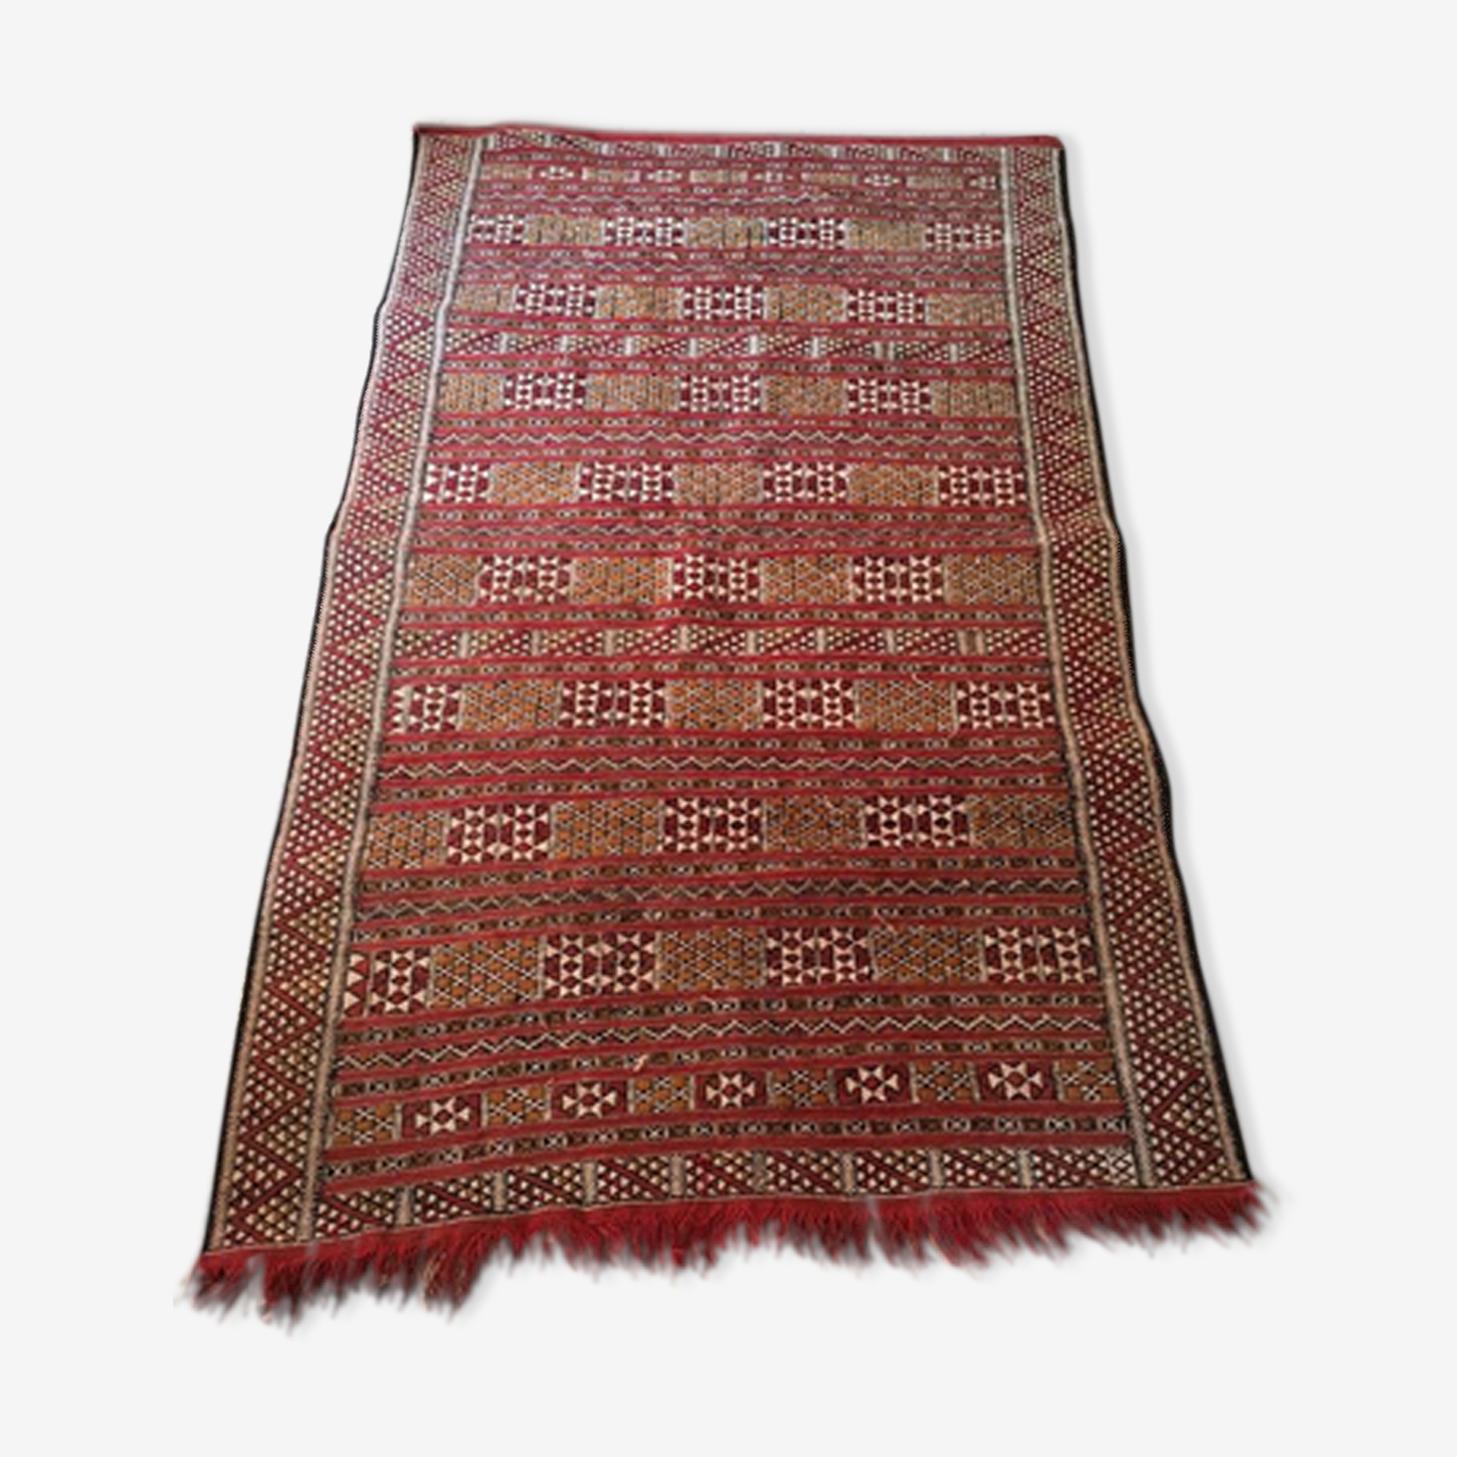 Tapis kilim marocain 185x113cm